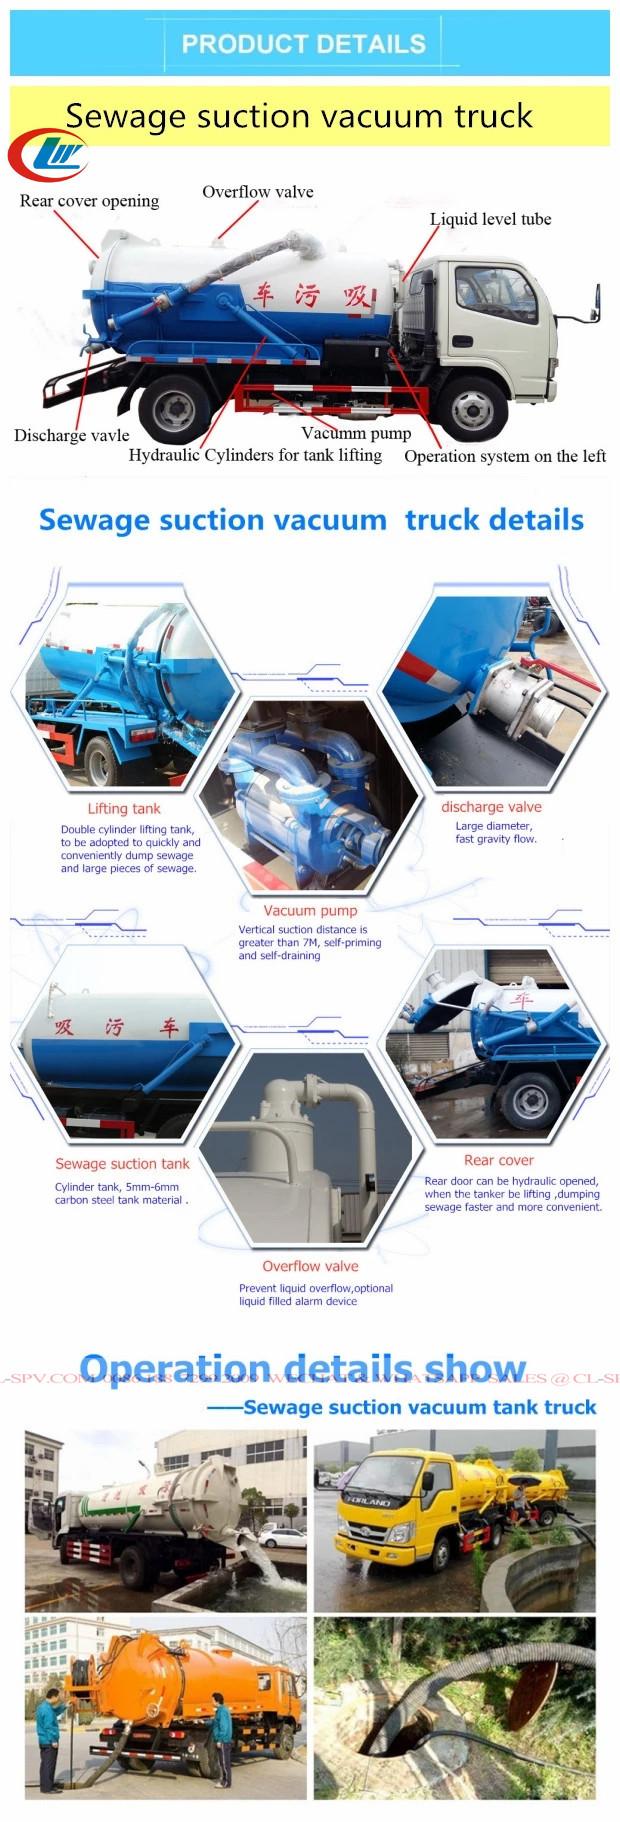 Howo ویکیوم سیوریج فضلہ ٹرک کی تفصیلات